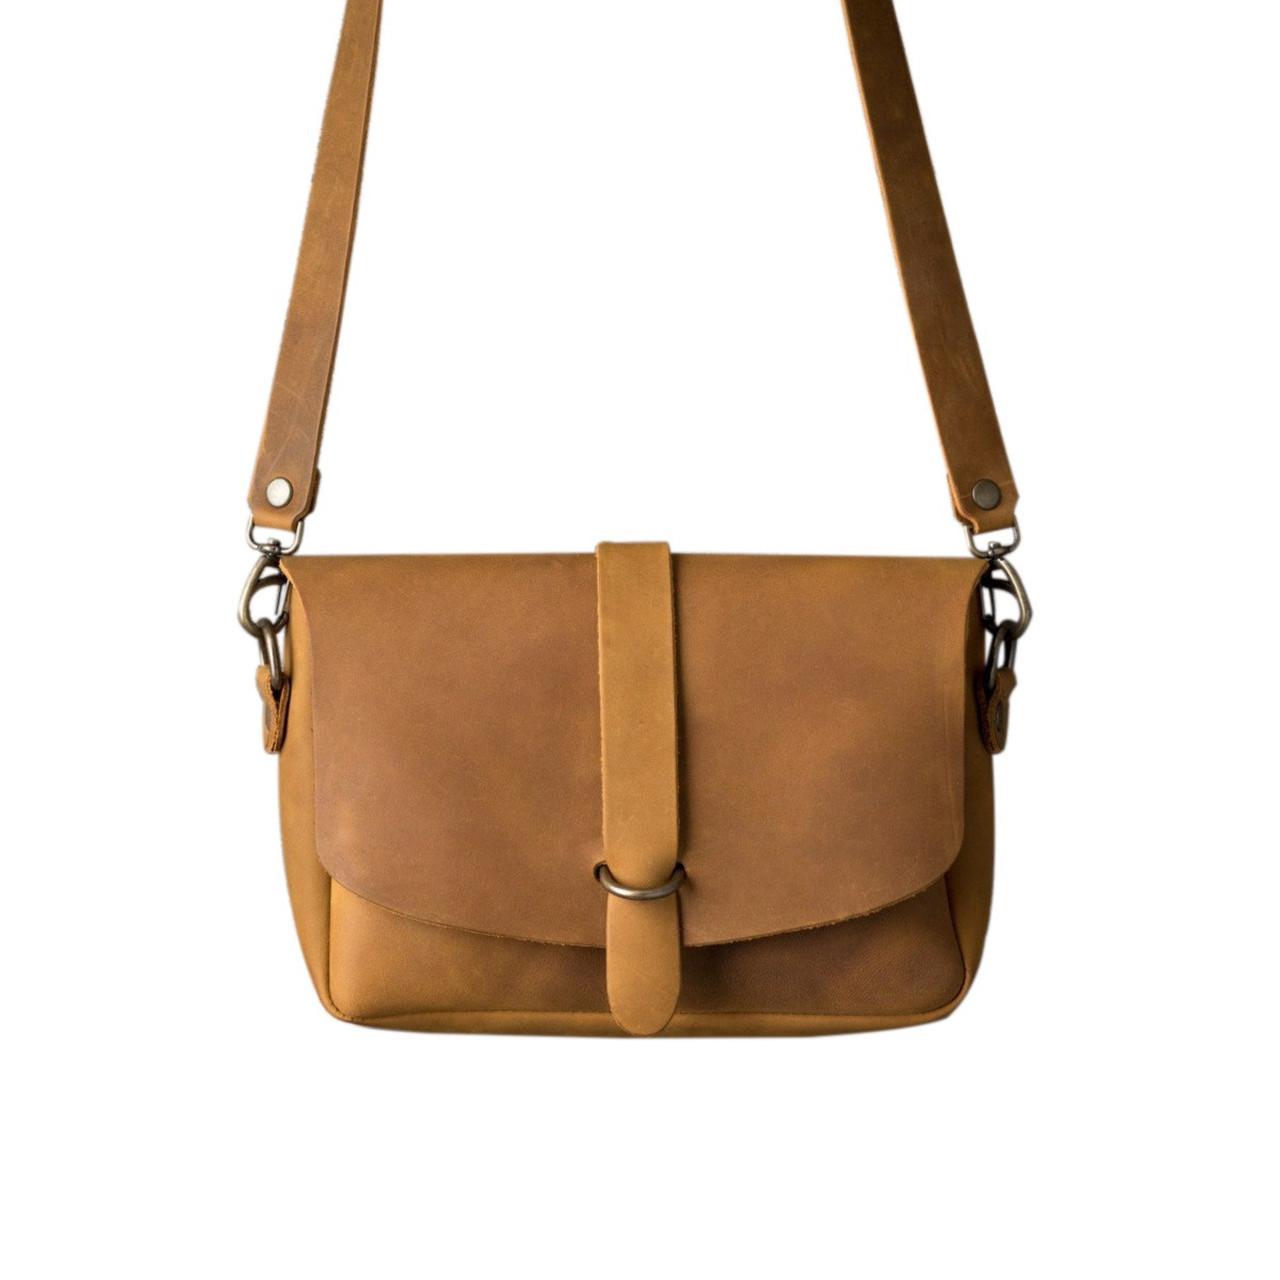 Backpack Kangaroo Pocket Chocolate Distress Leather  Body Crossbag